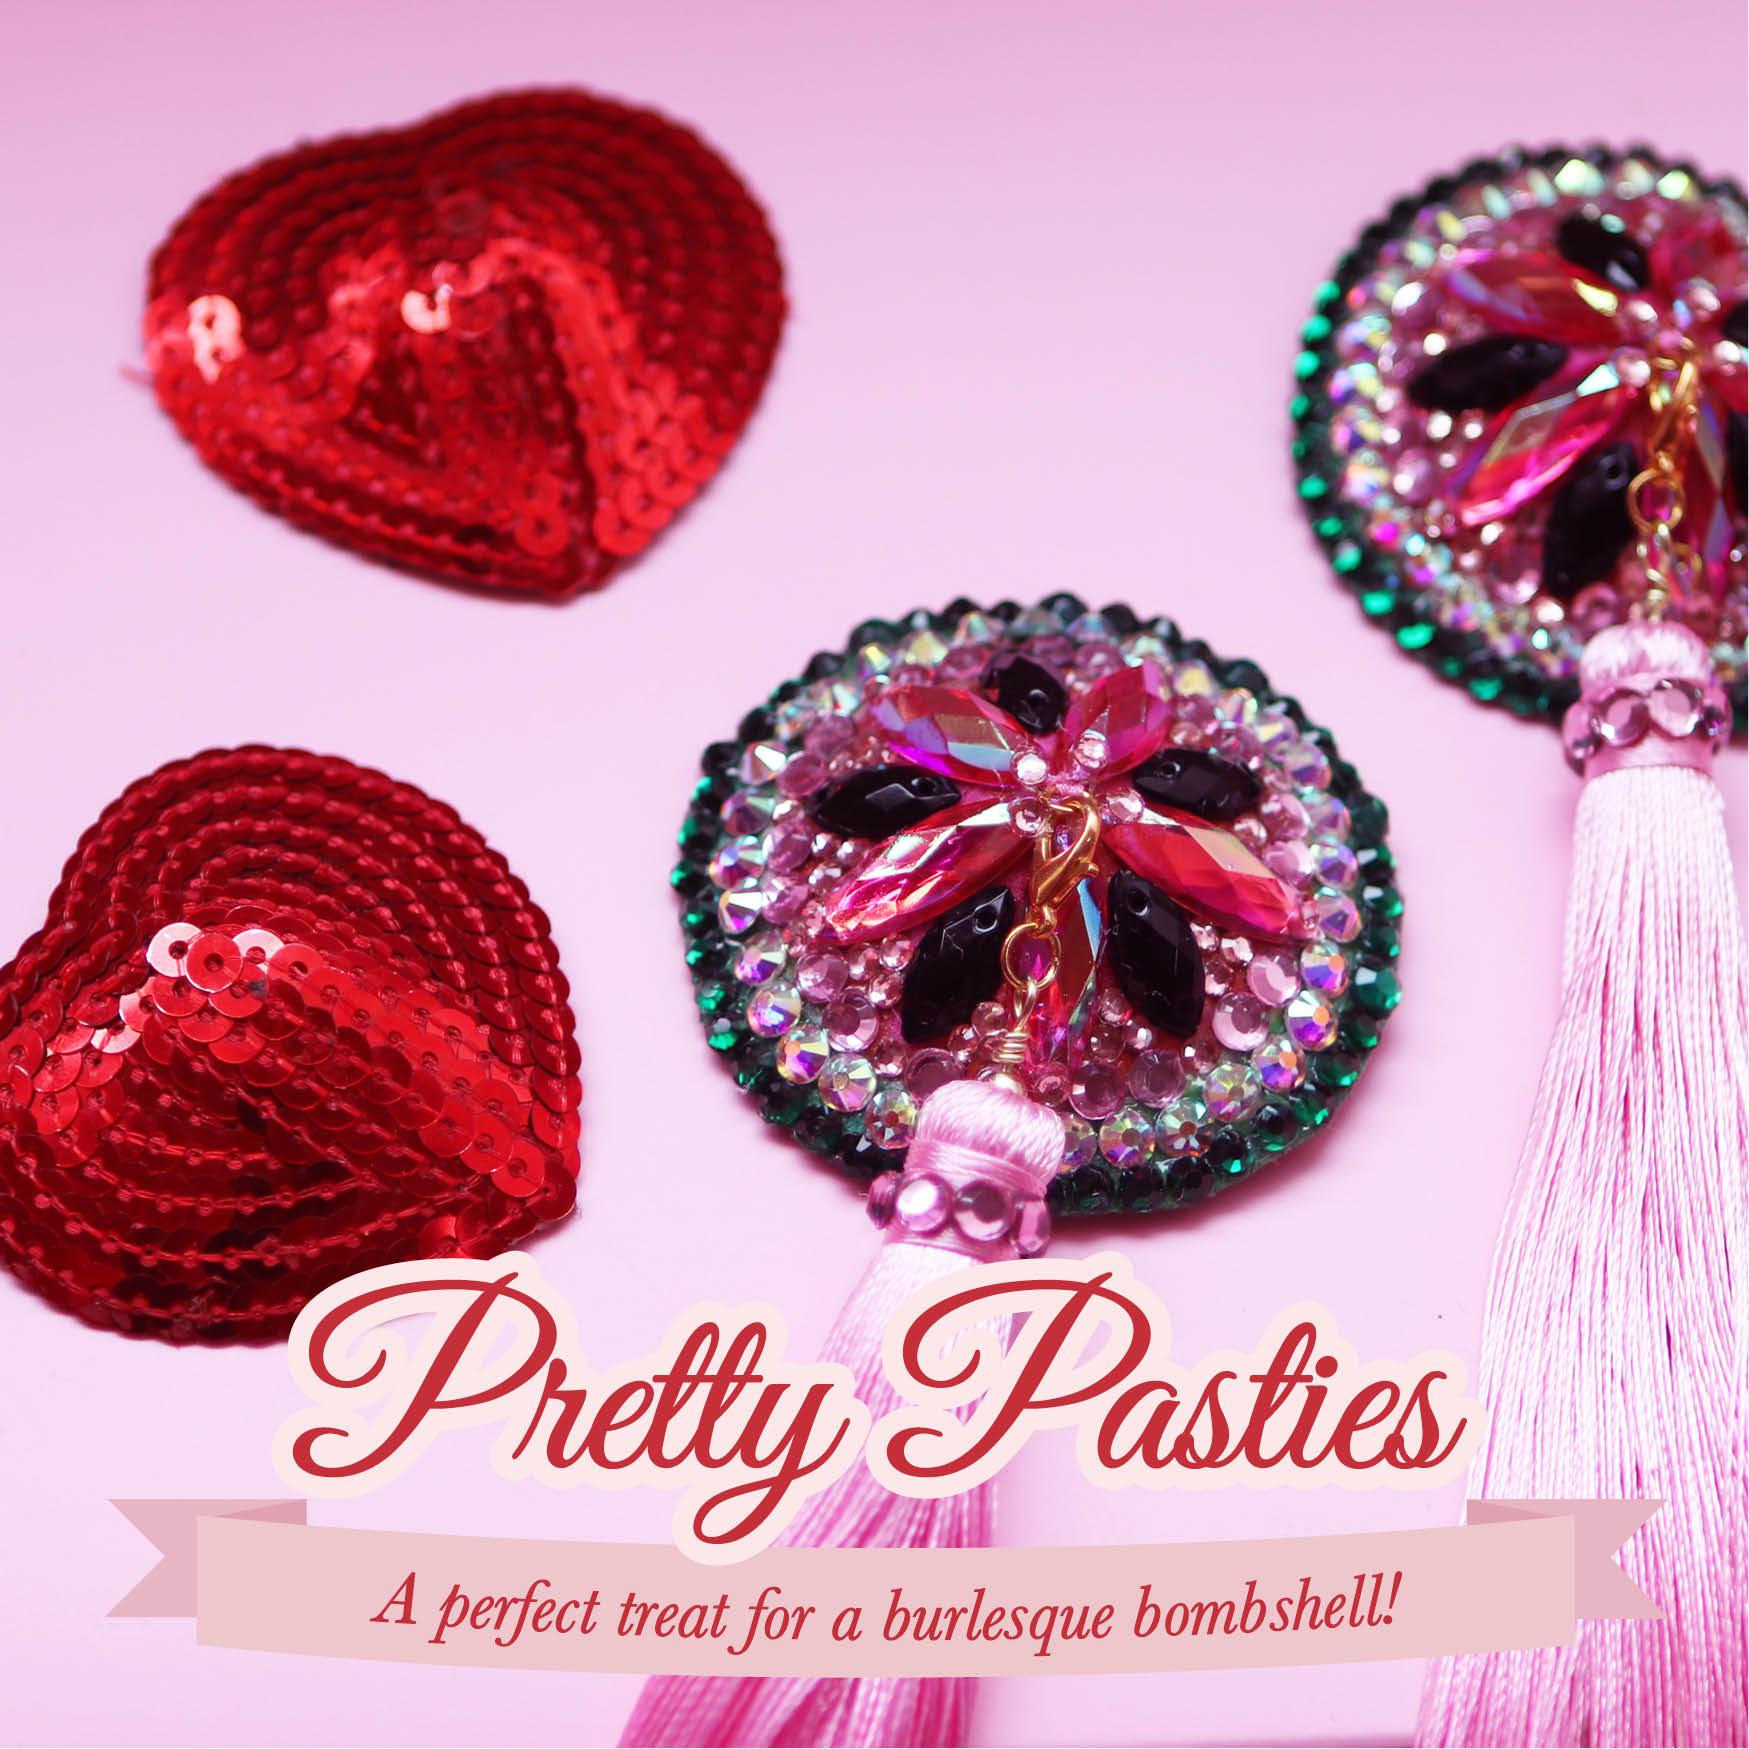 Pretty-pasties.jpg